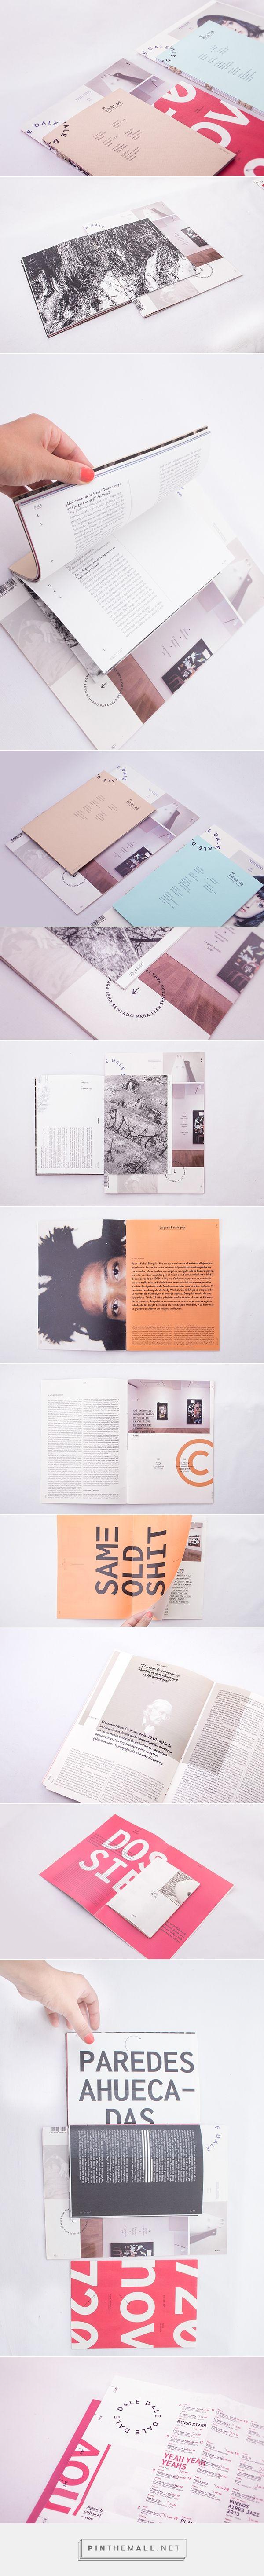 DALE n.01 mag / by Florencia Baldini